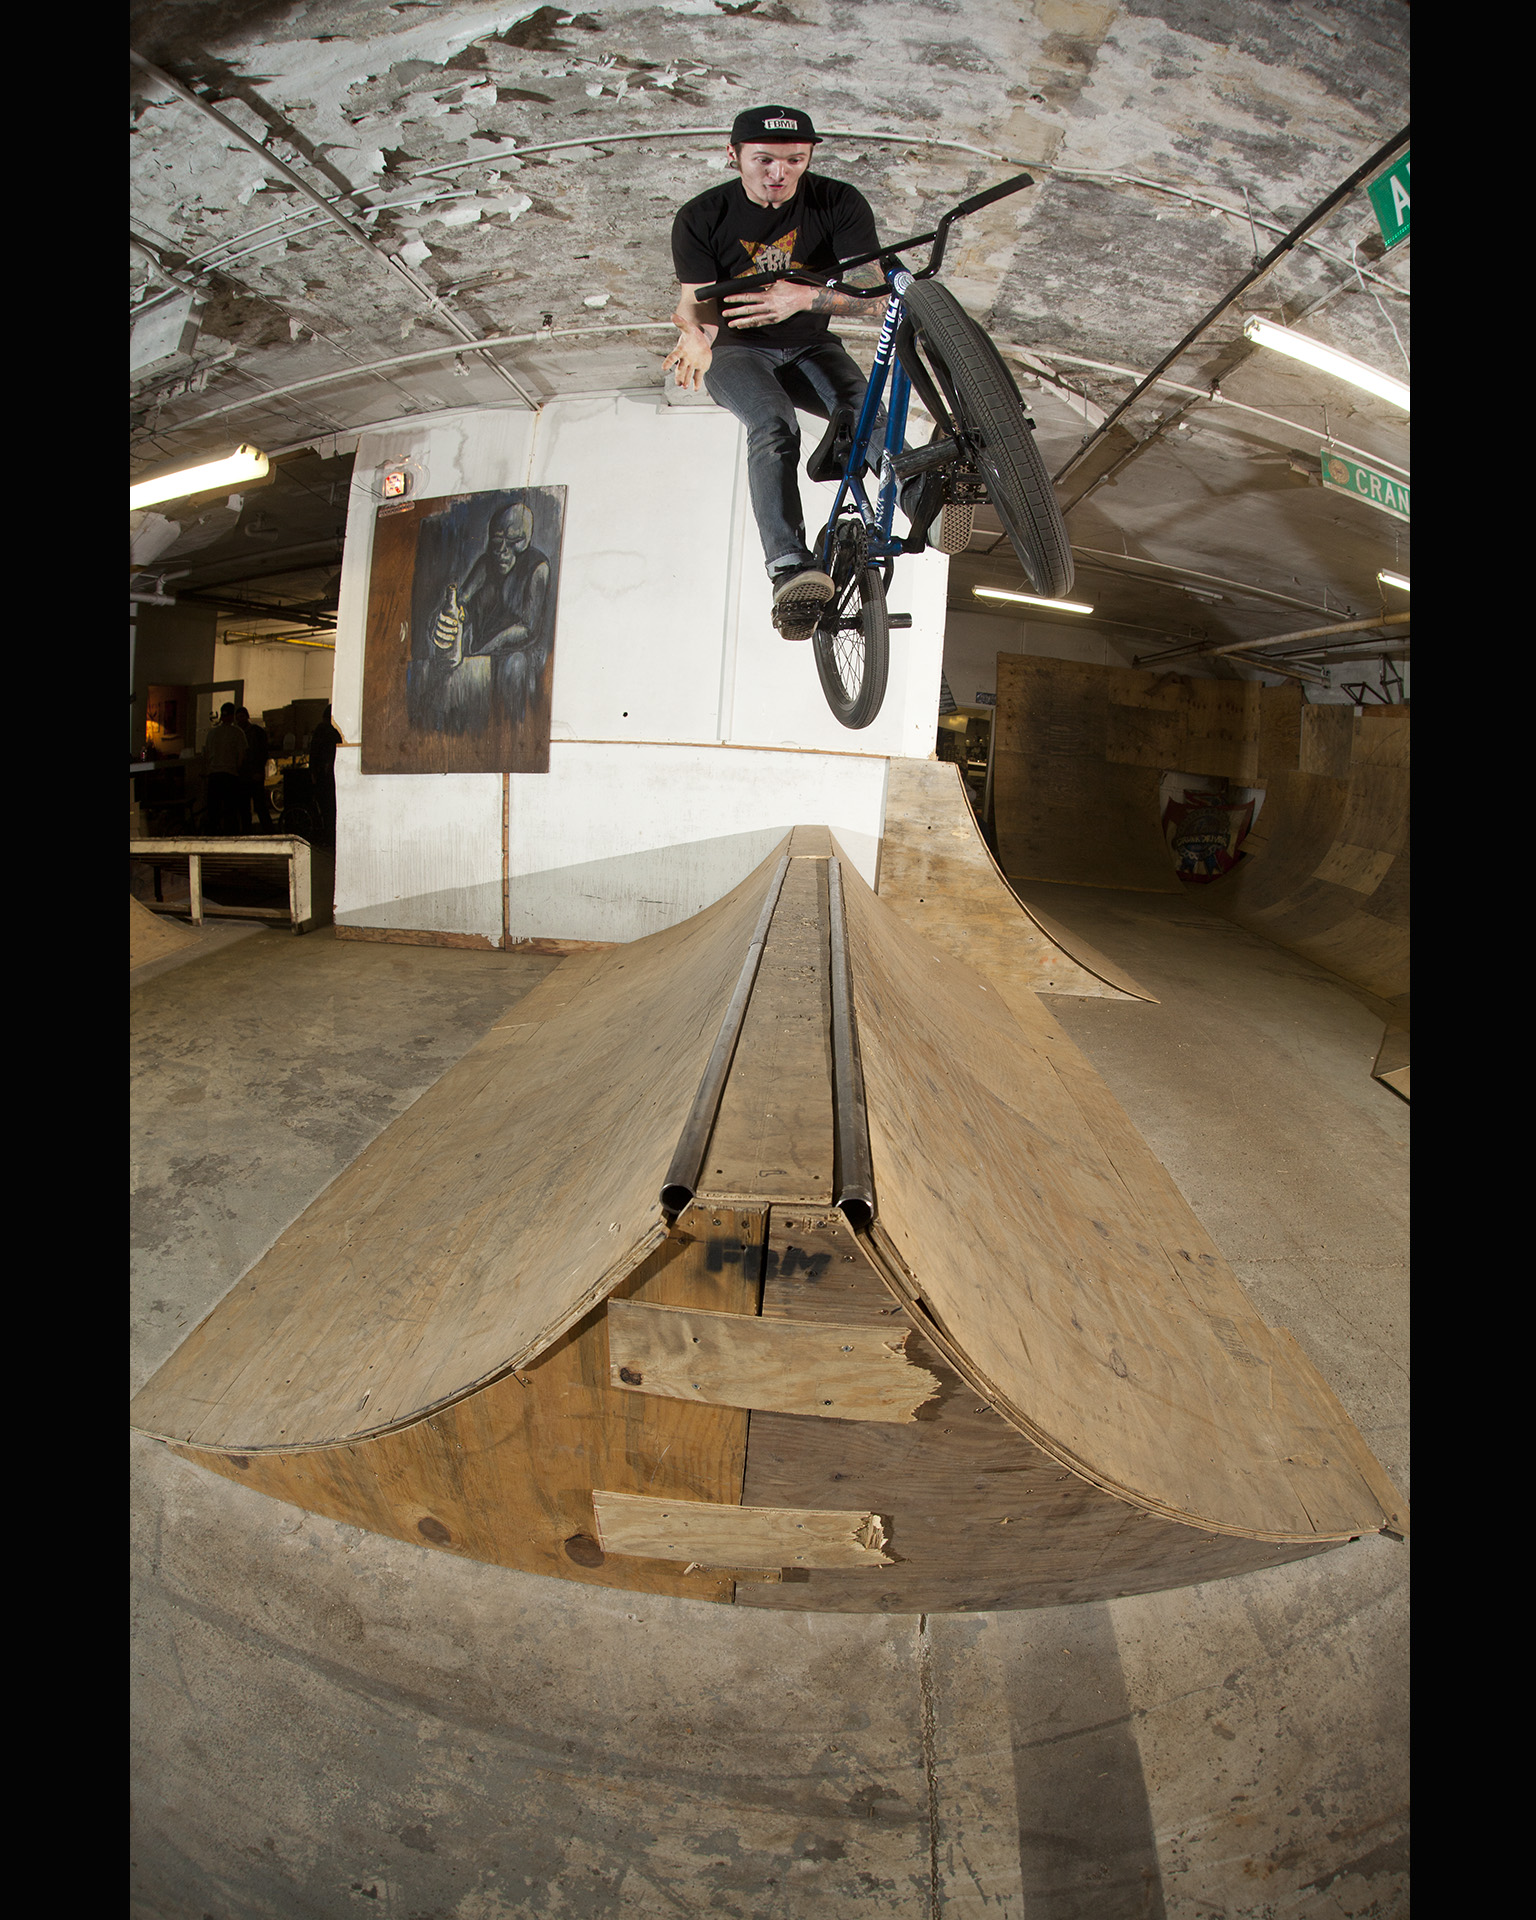 Dillon Leeper, 180 barspin